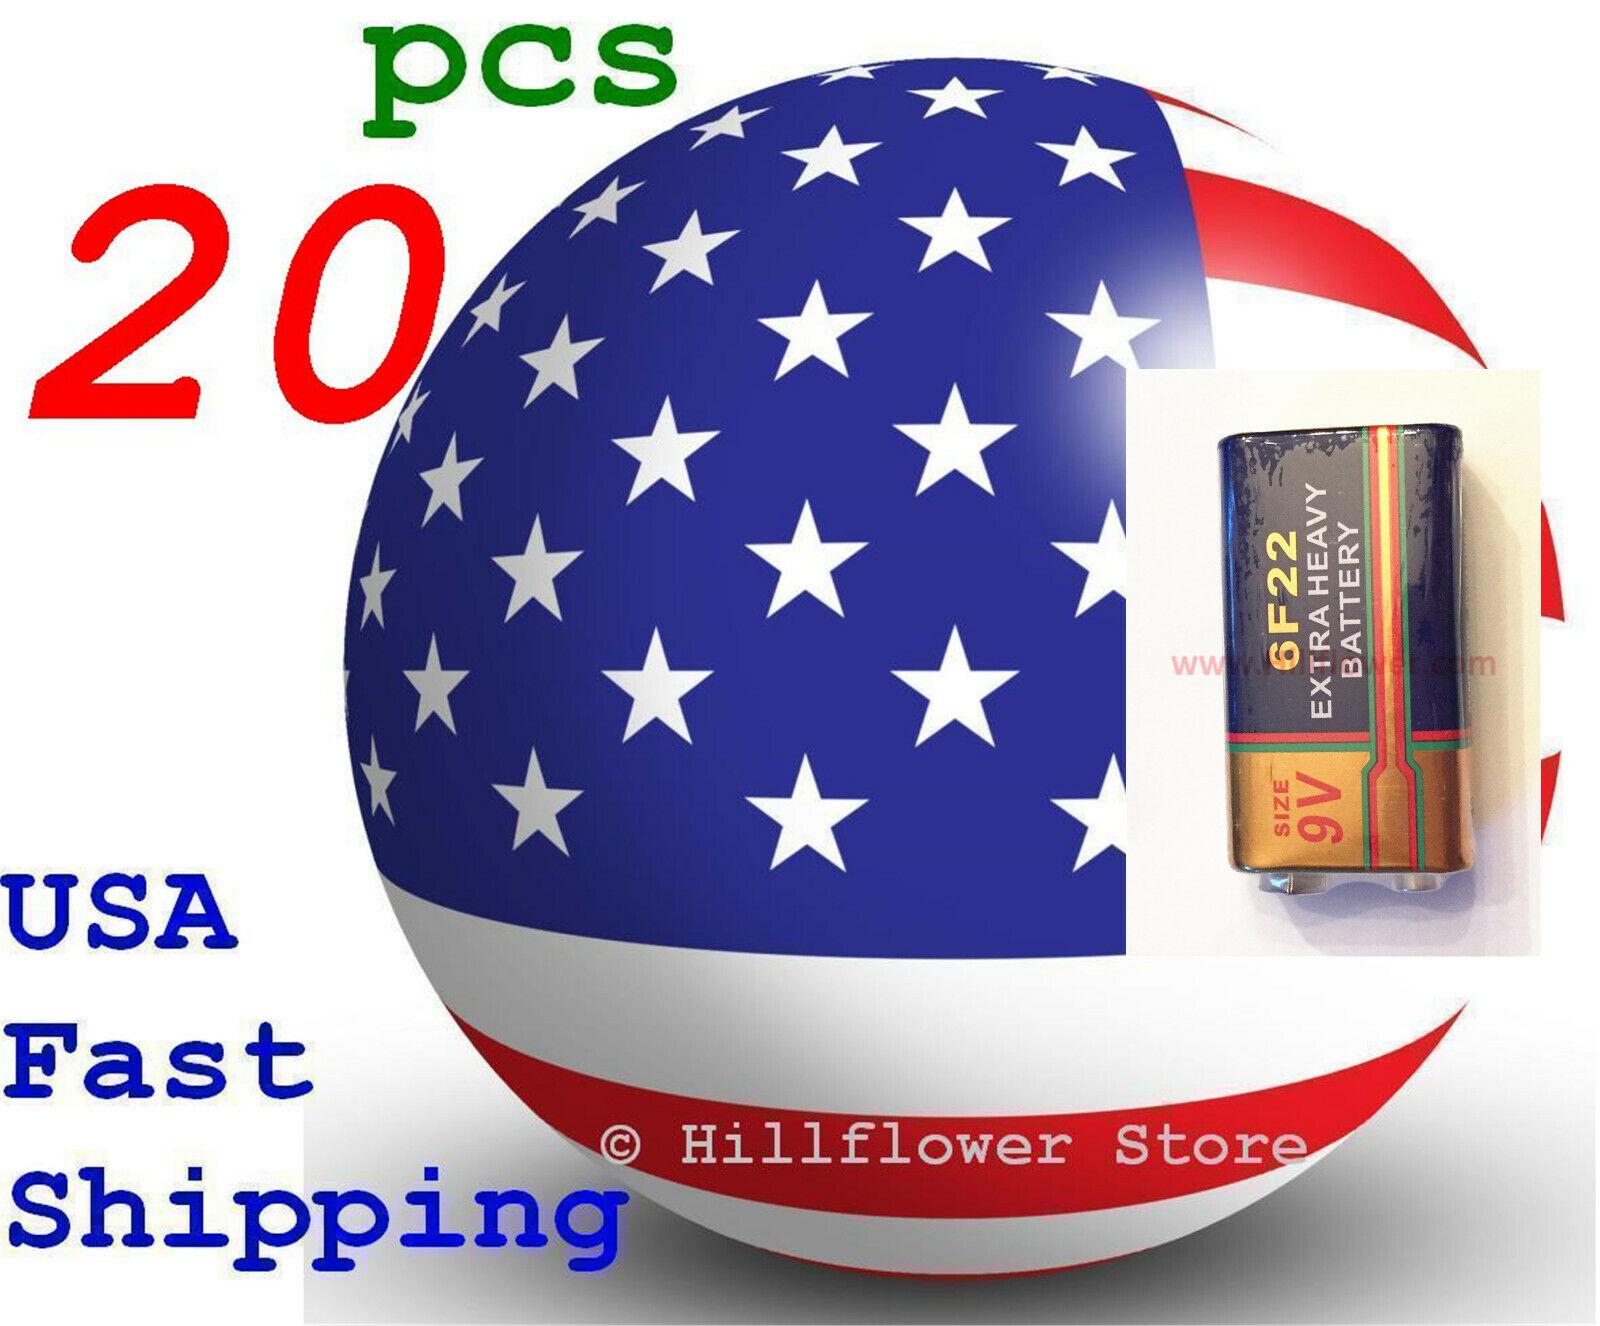 20 pcs 6F22 6LR61 Super Heavy Duty Bulk 9V Zinc Carbon Battery